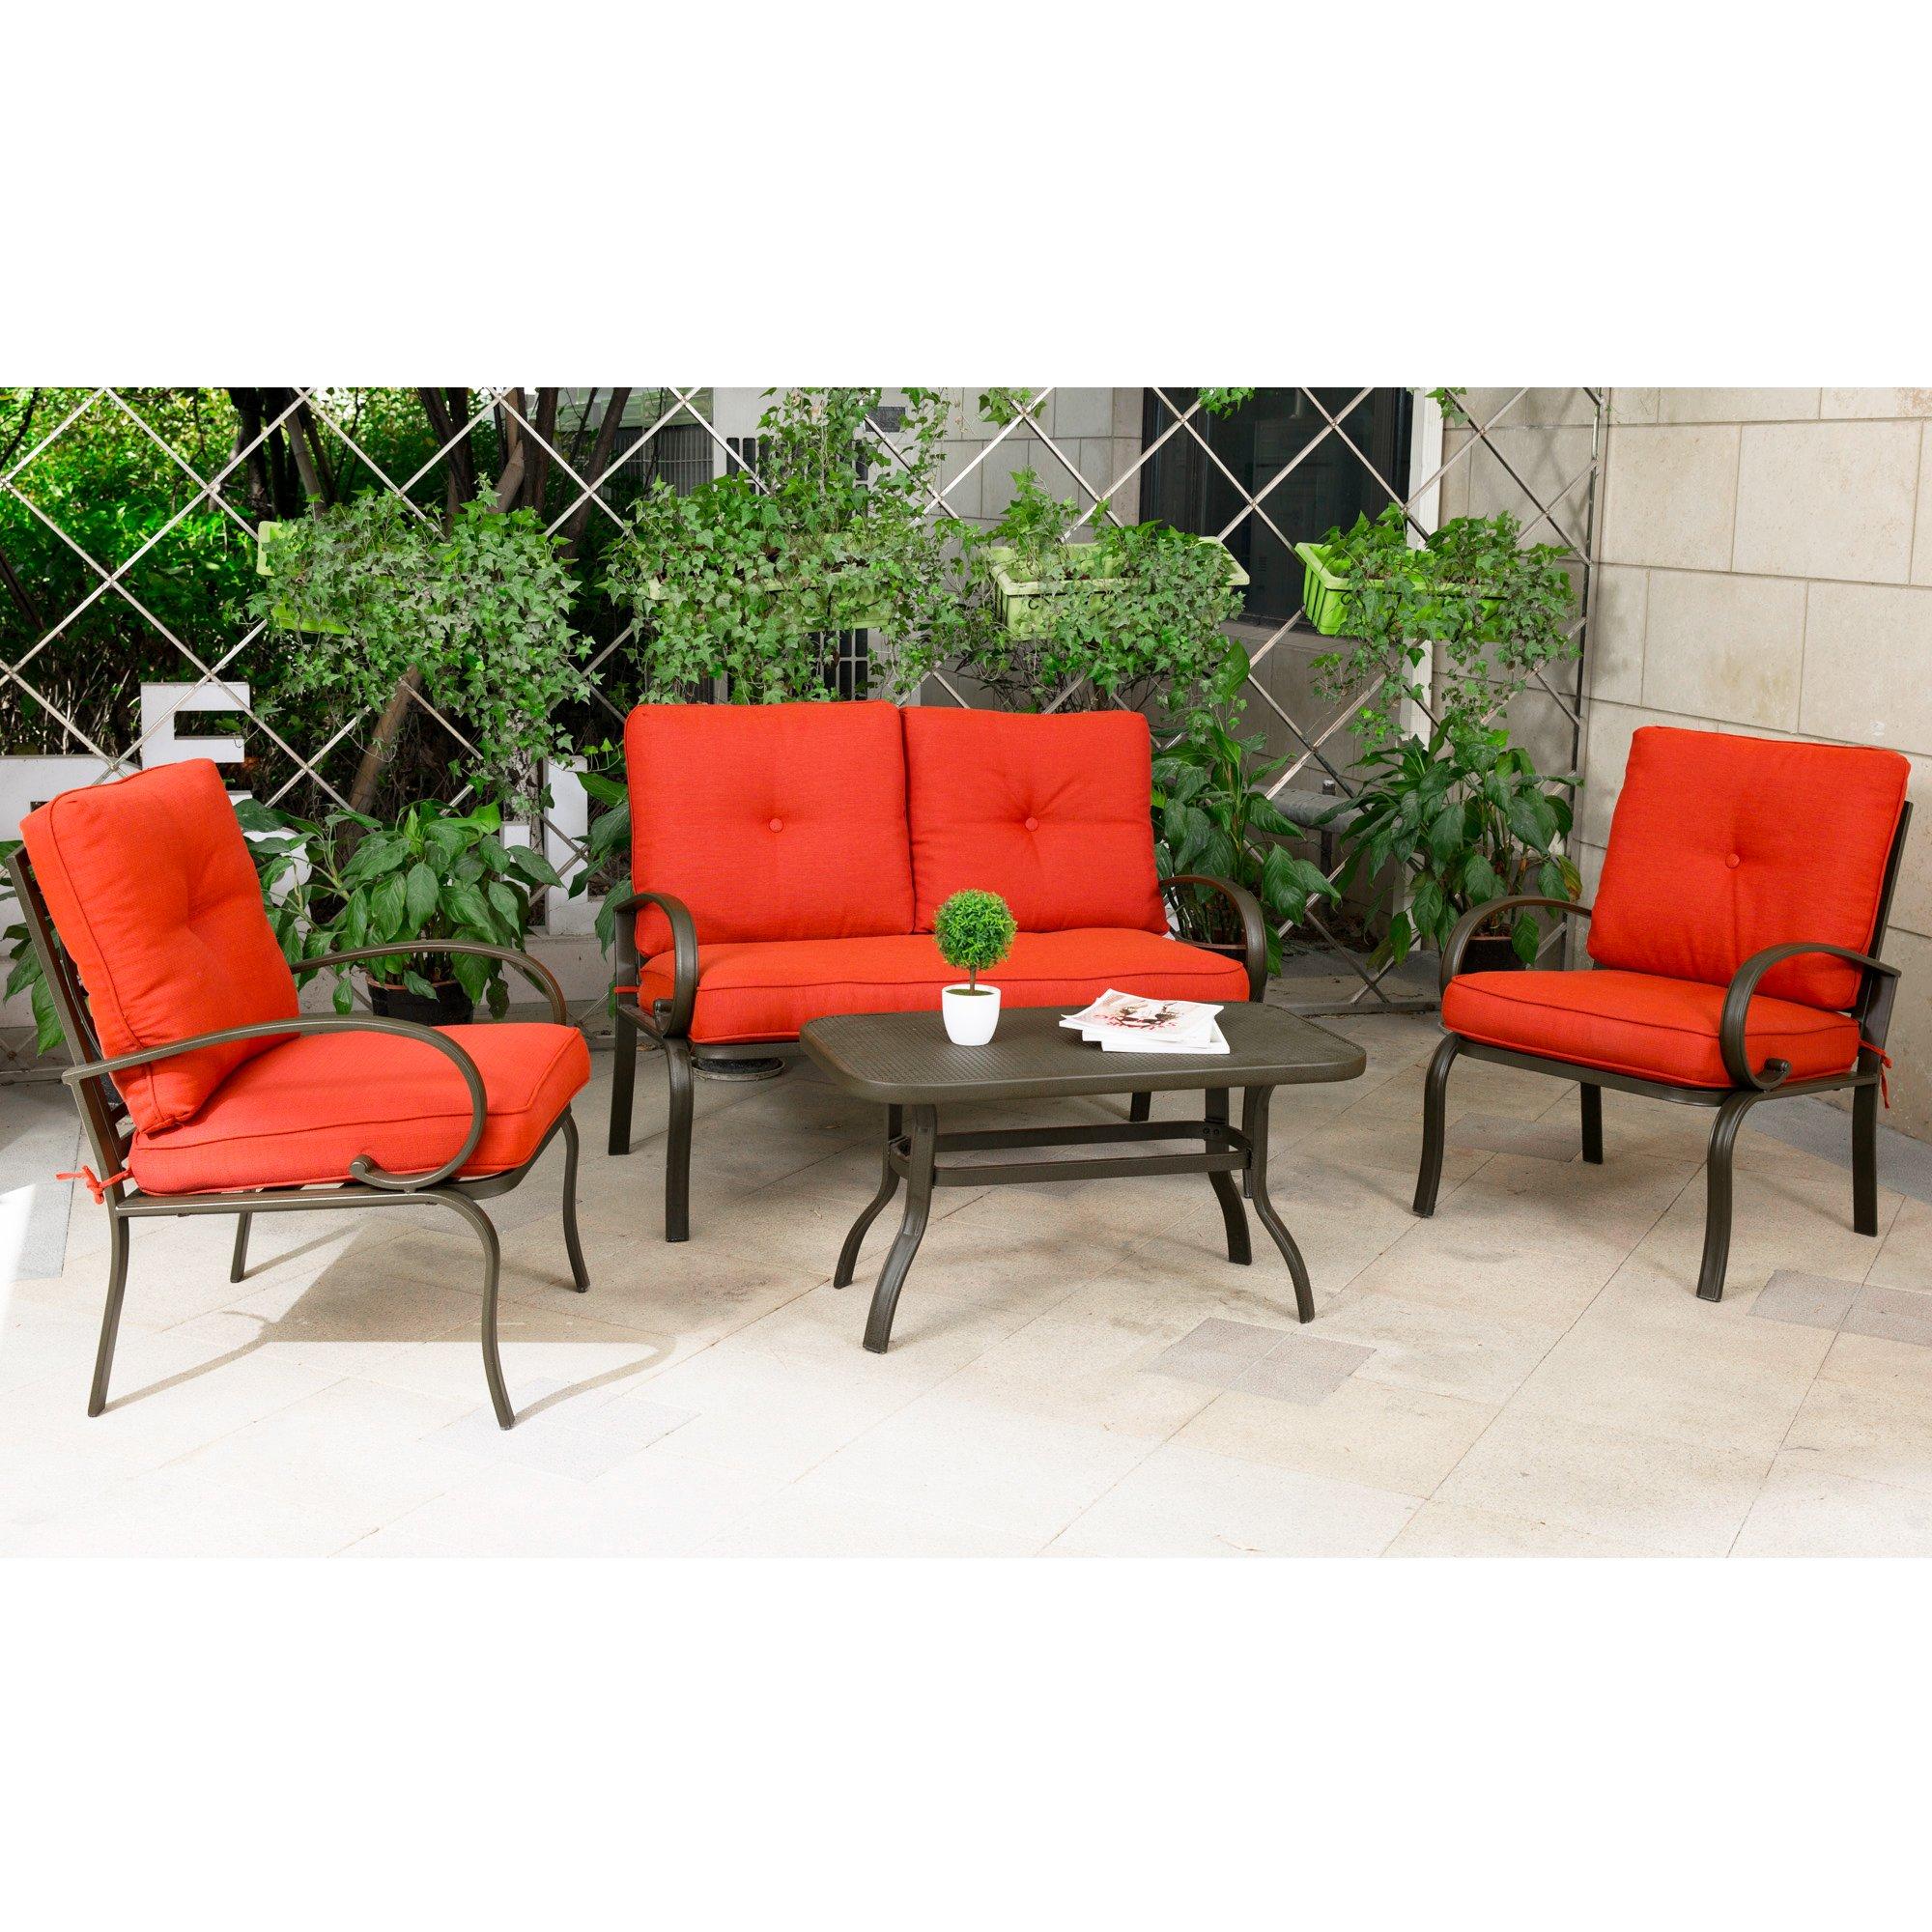 Breckenridge 4 Piece Patio Furniture Set Two Swivel: Best Rated In Patio Conversation Sets & Helpful Customer